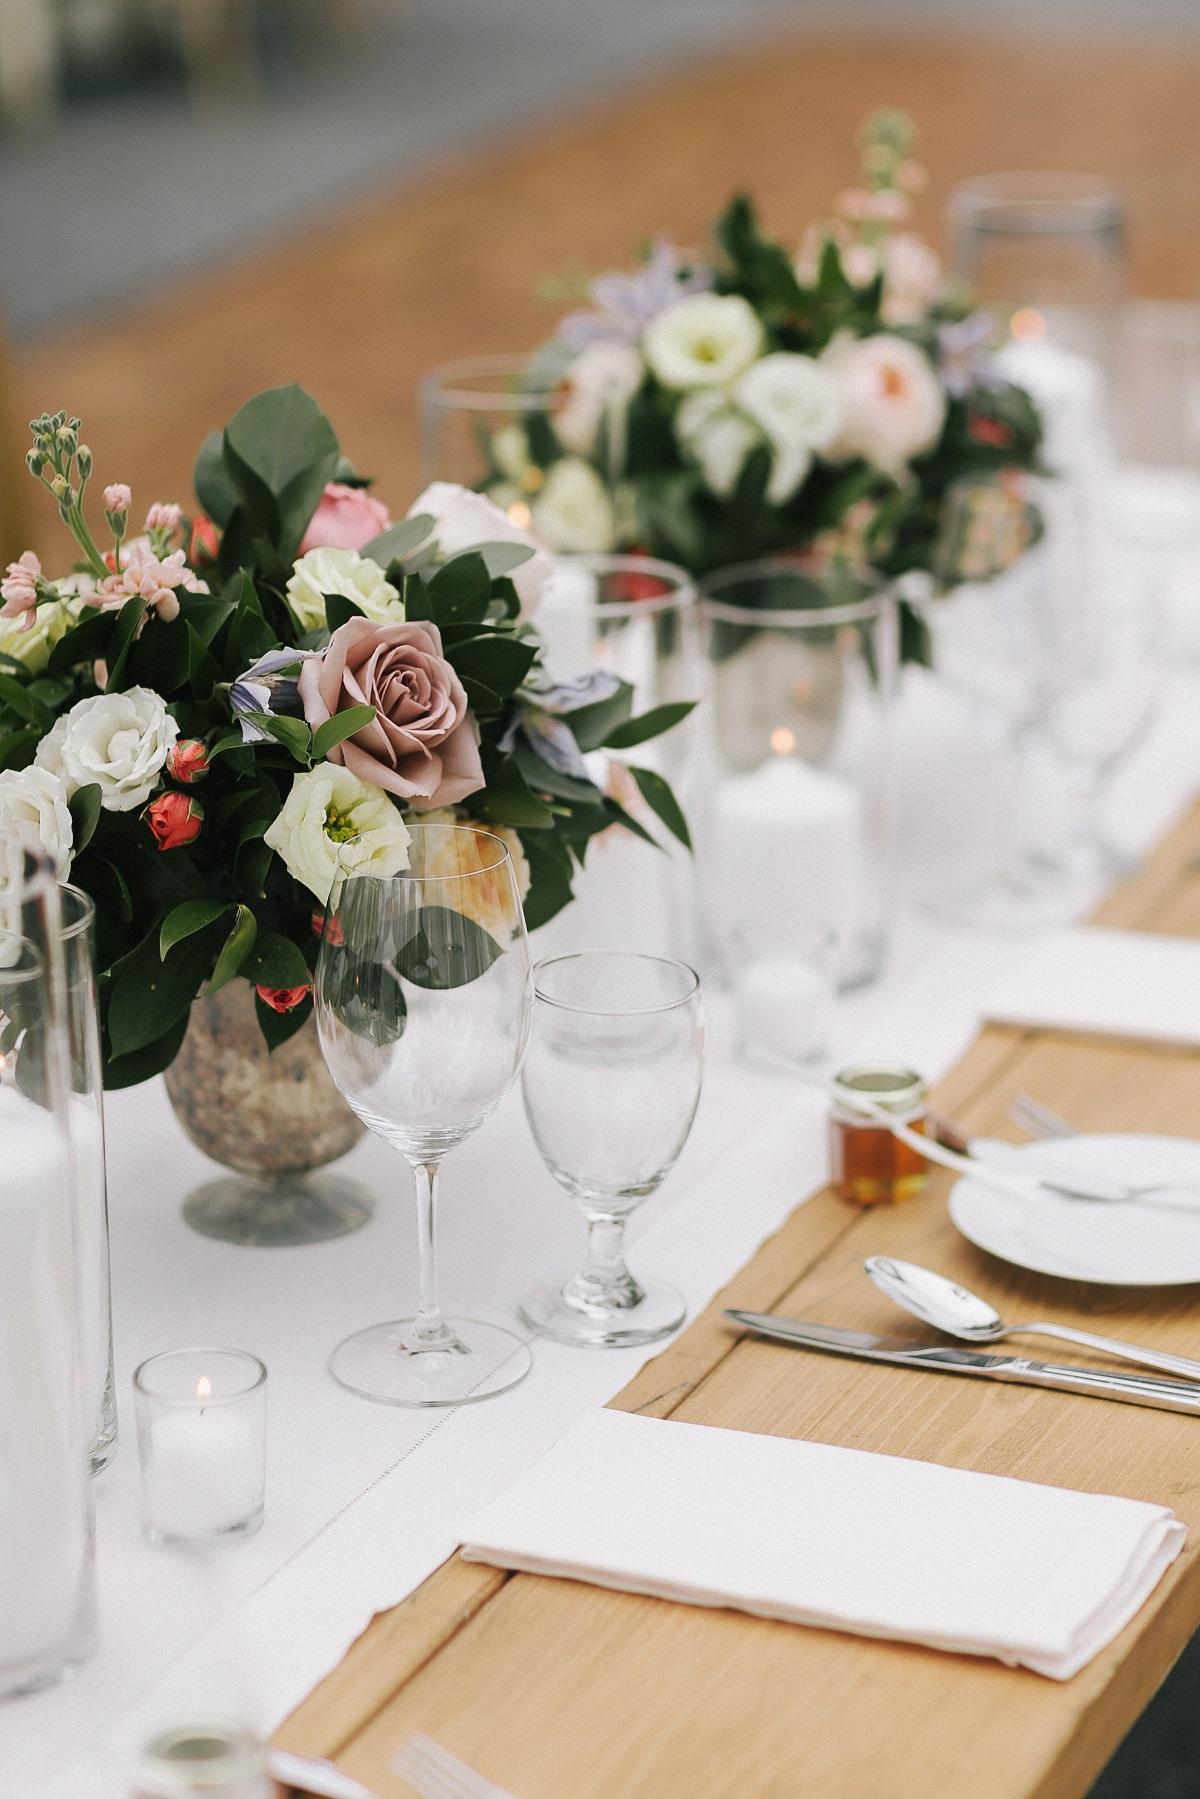 tented-wedding-planner-ancaster-kj-and-co 24.JPG